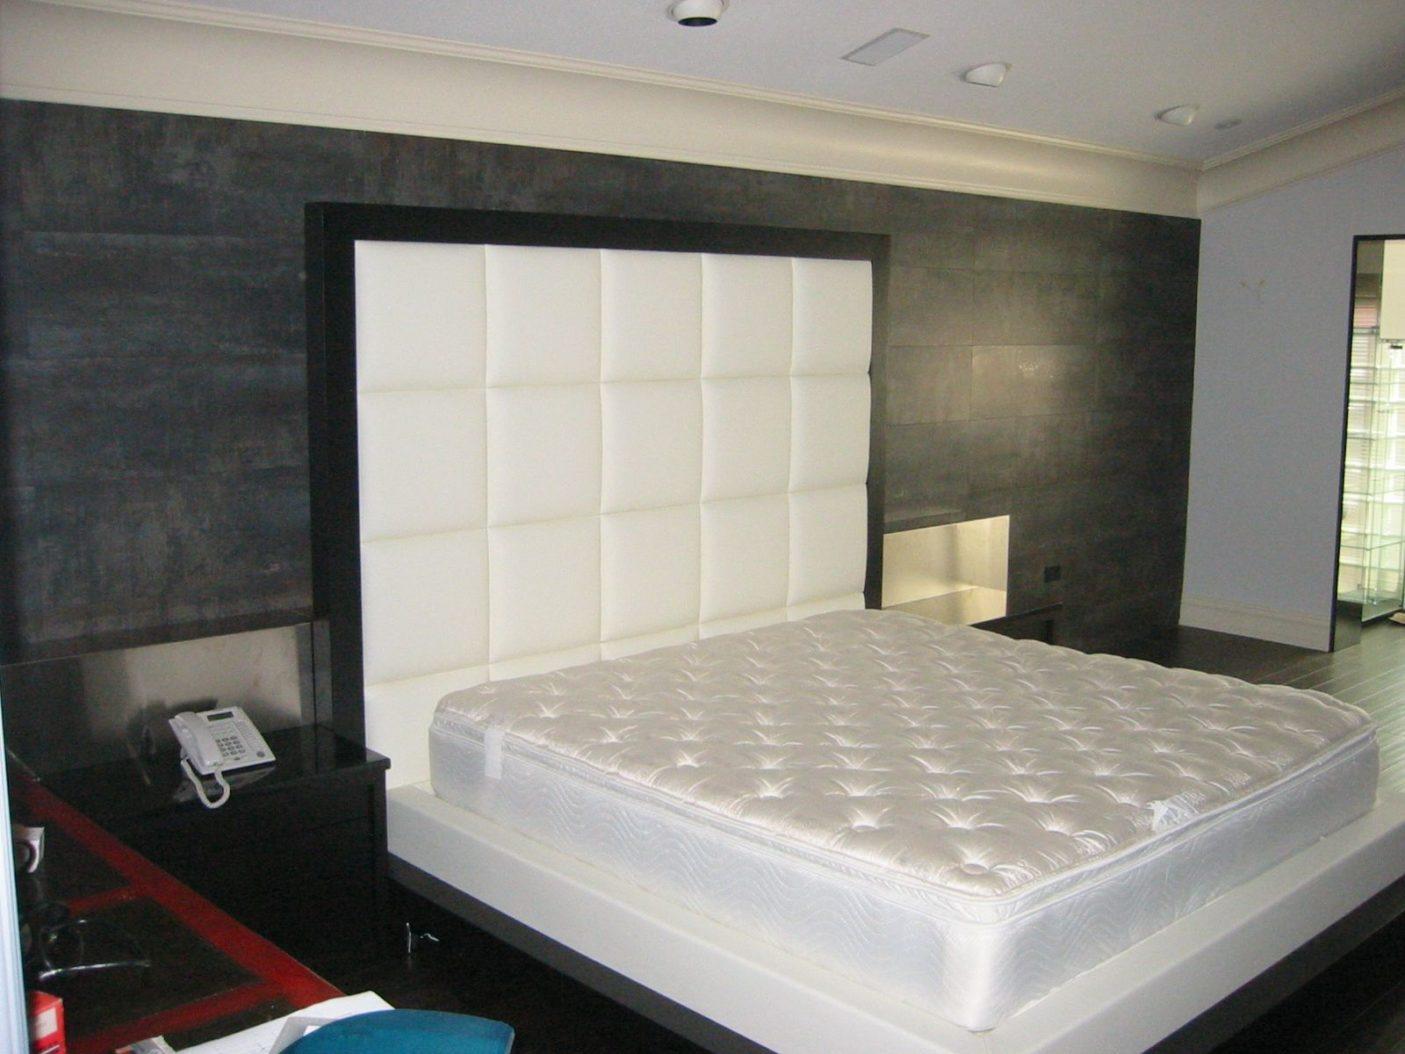 Bed-15.jpg